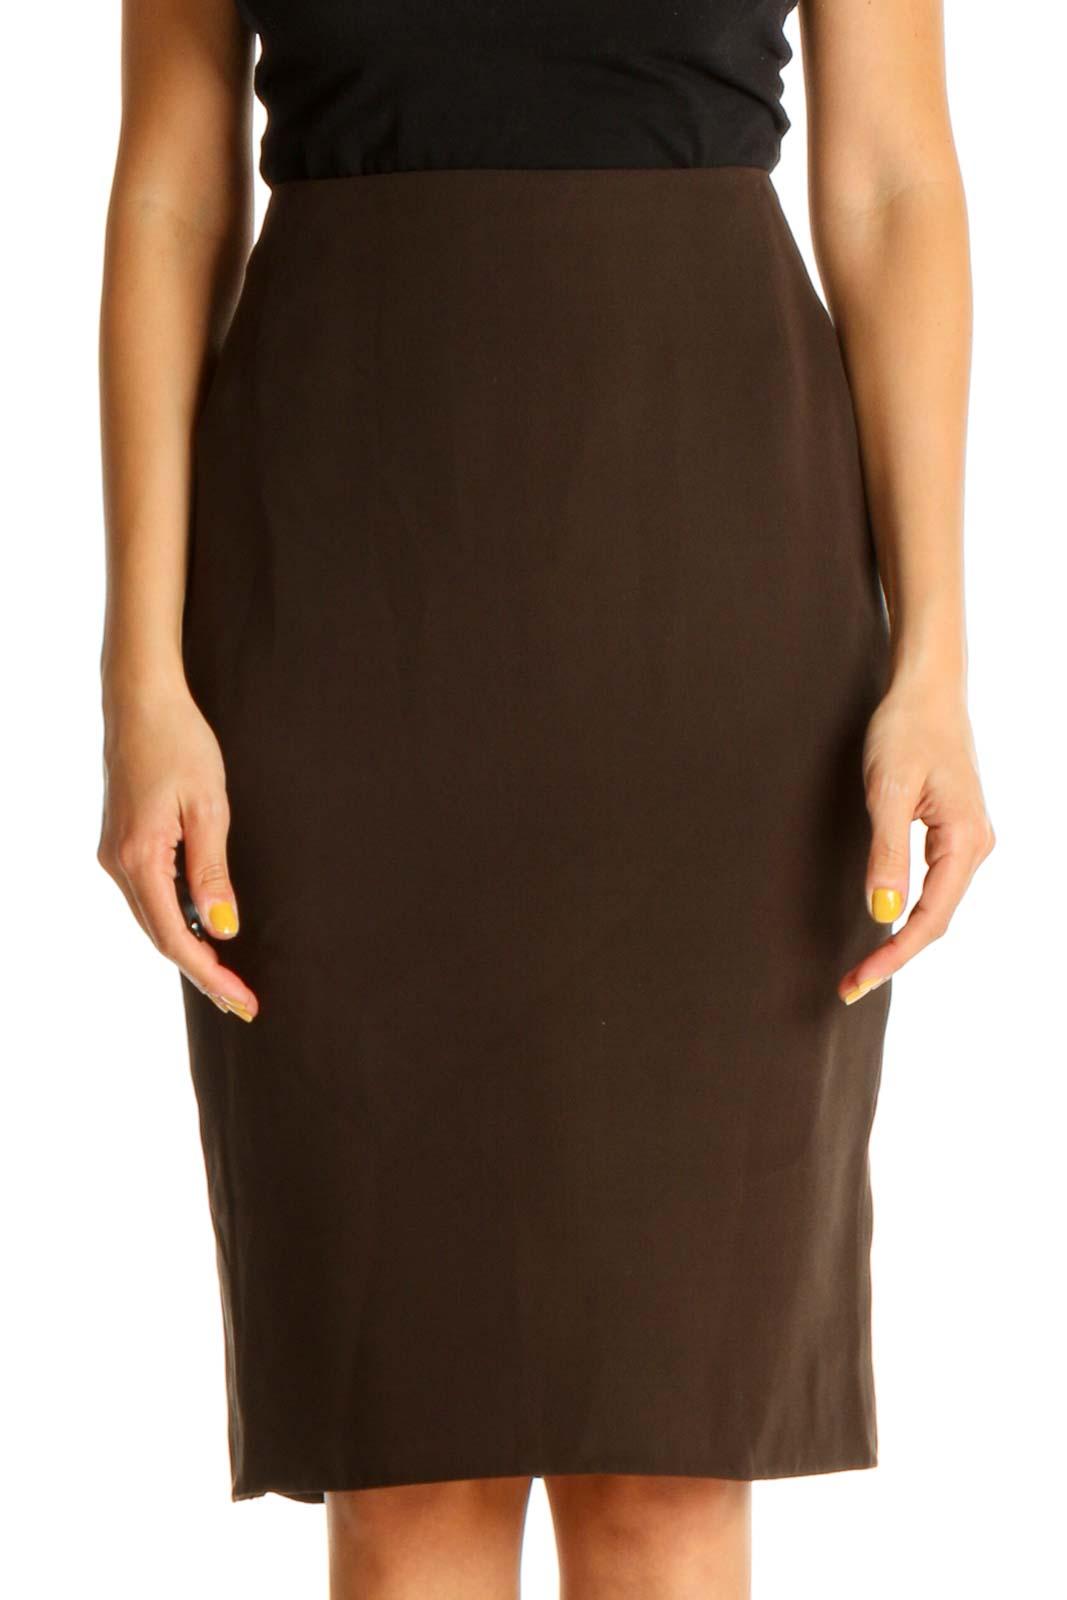 Brown Solid Brunch Pencil Skirt Front